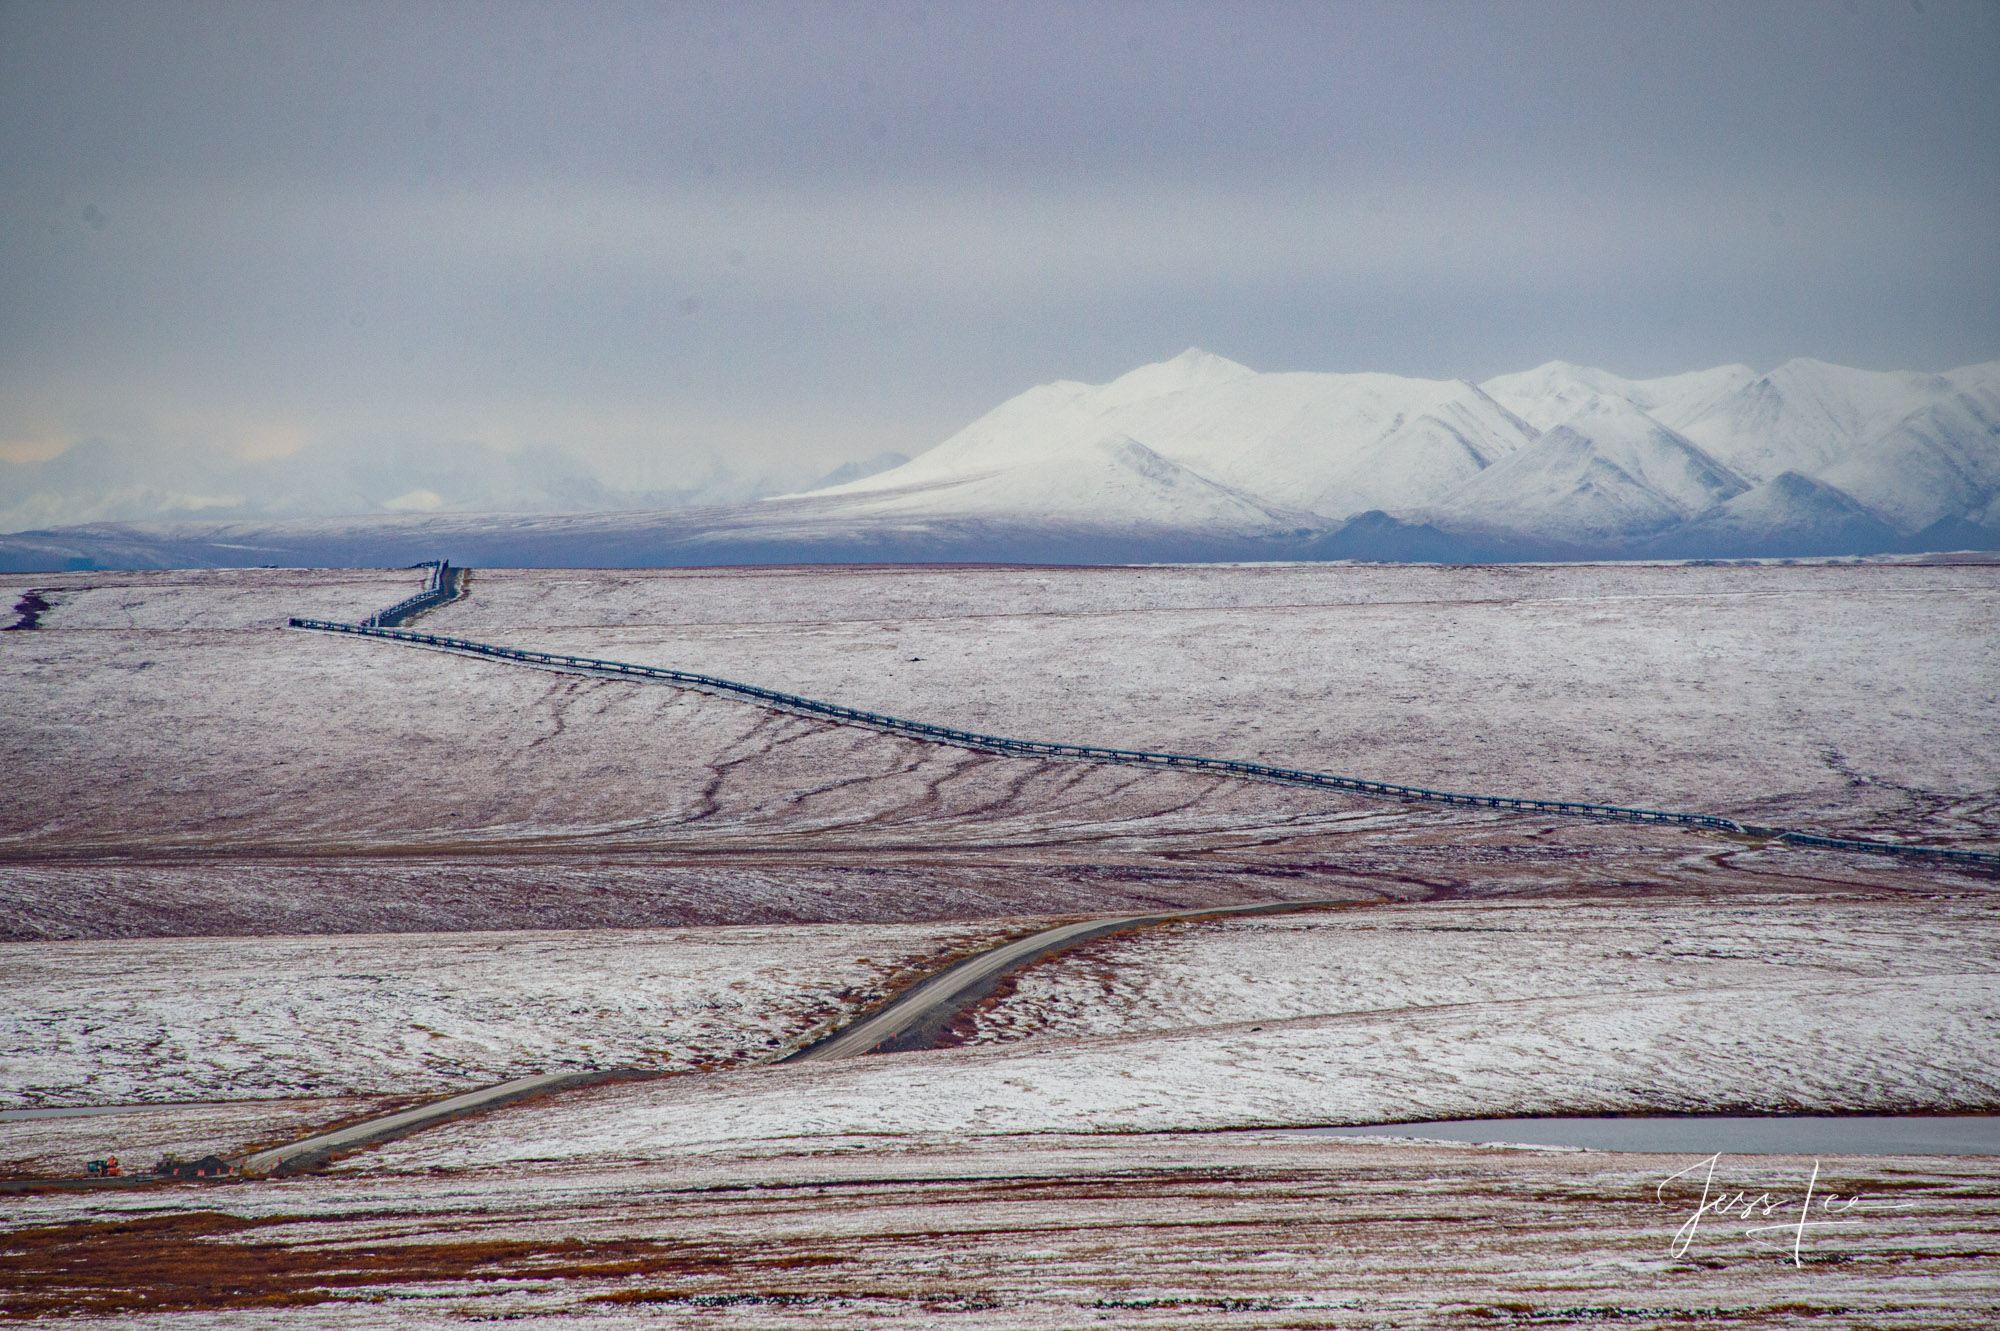 Road cutting through Arctic tundra in Alaska